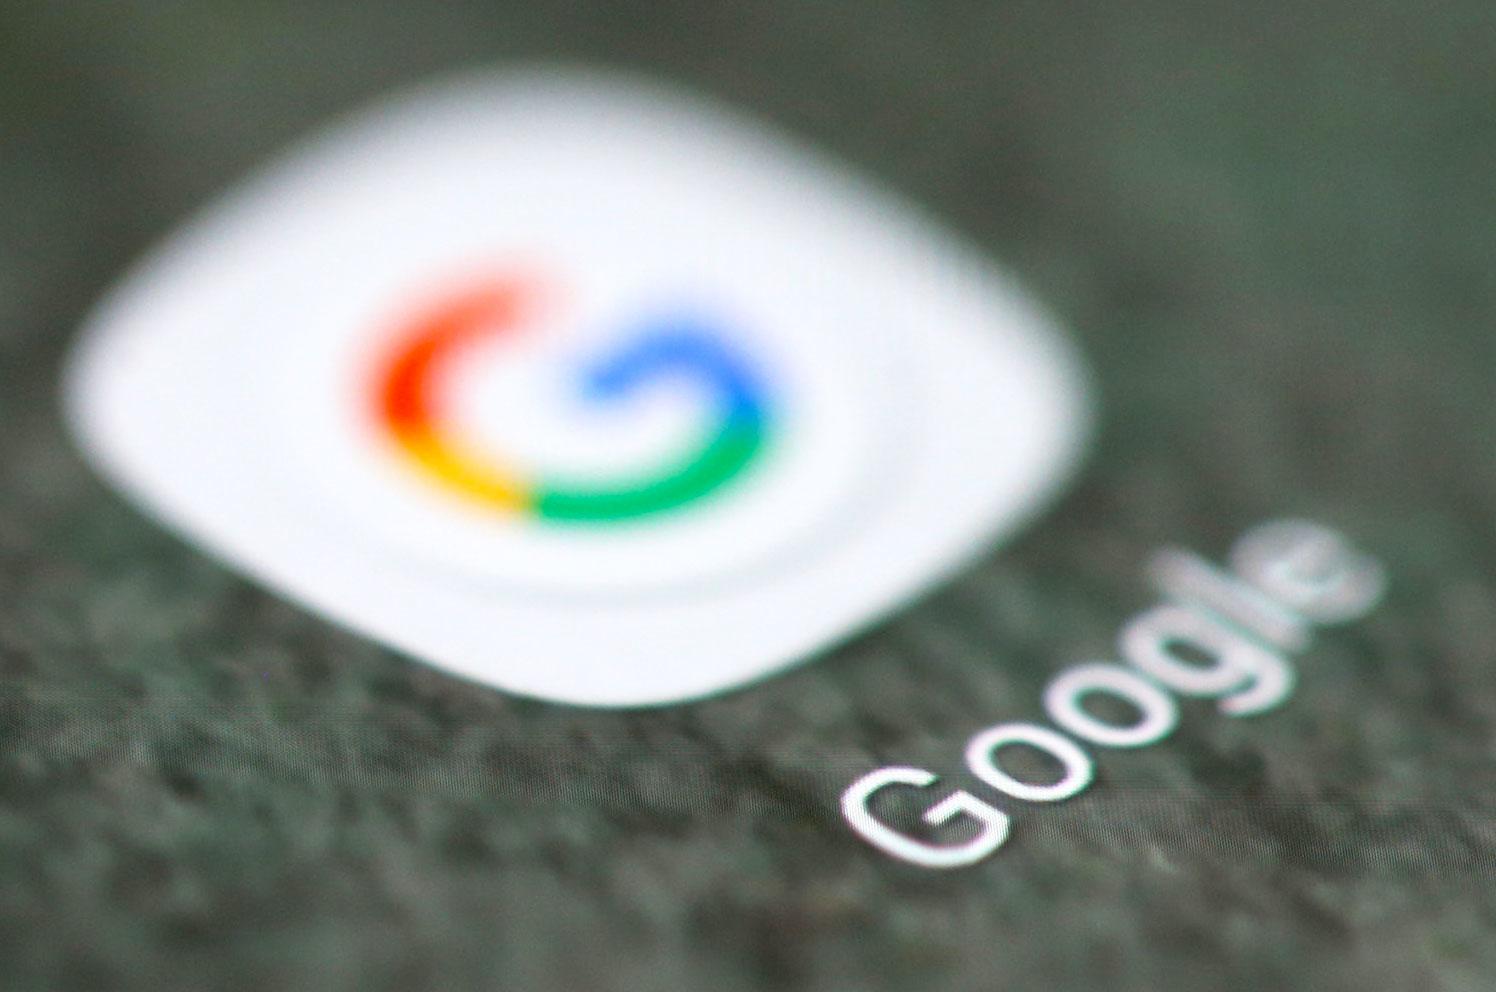 Google ปิดฉาก Google+ หลังโคม่าข้อมูลรั่วไหล